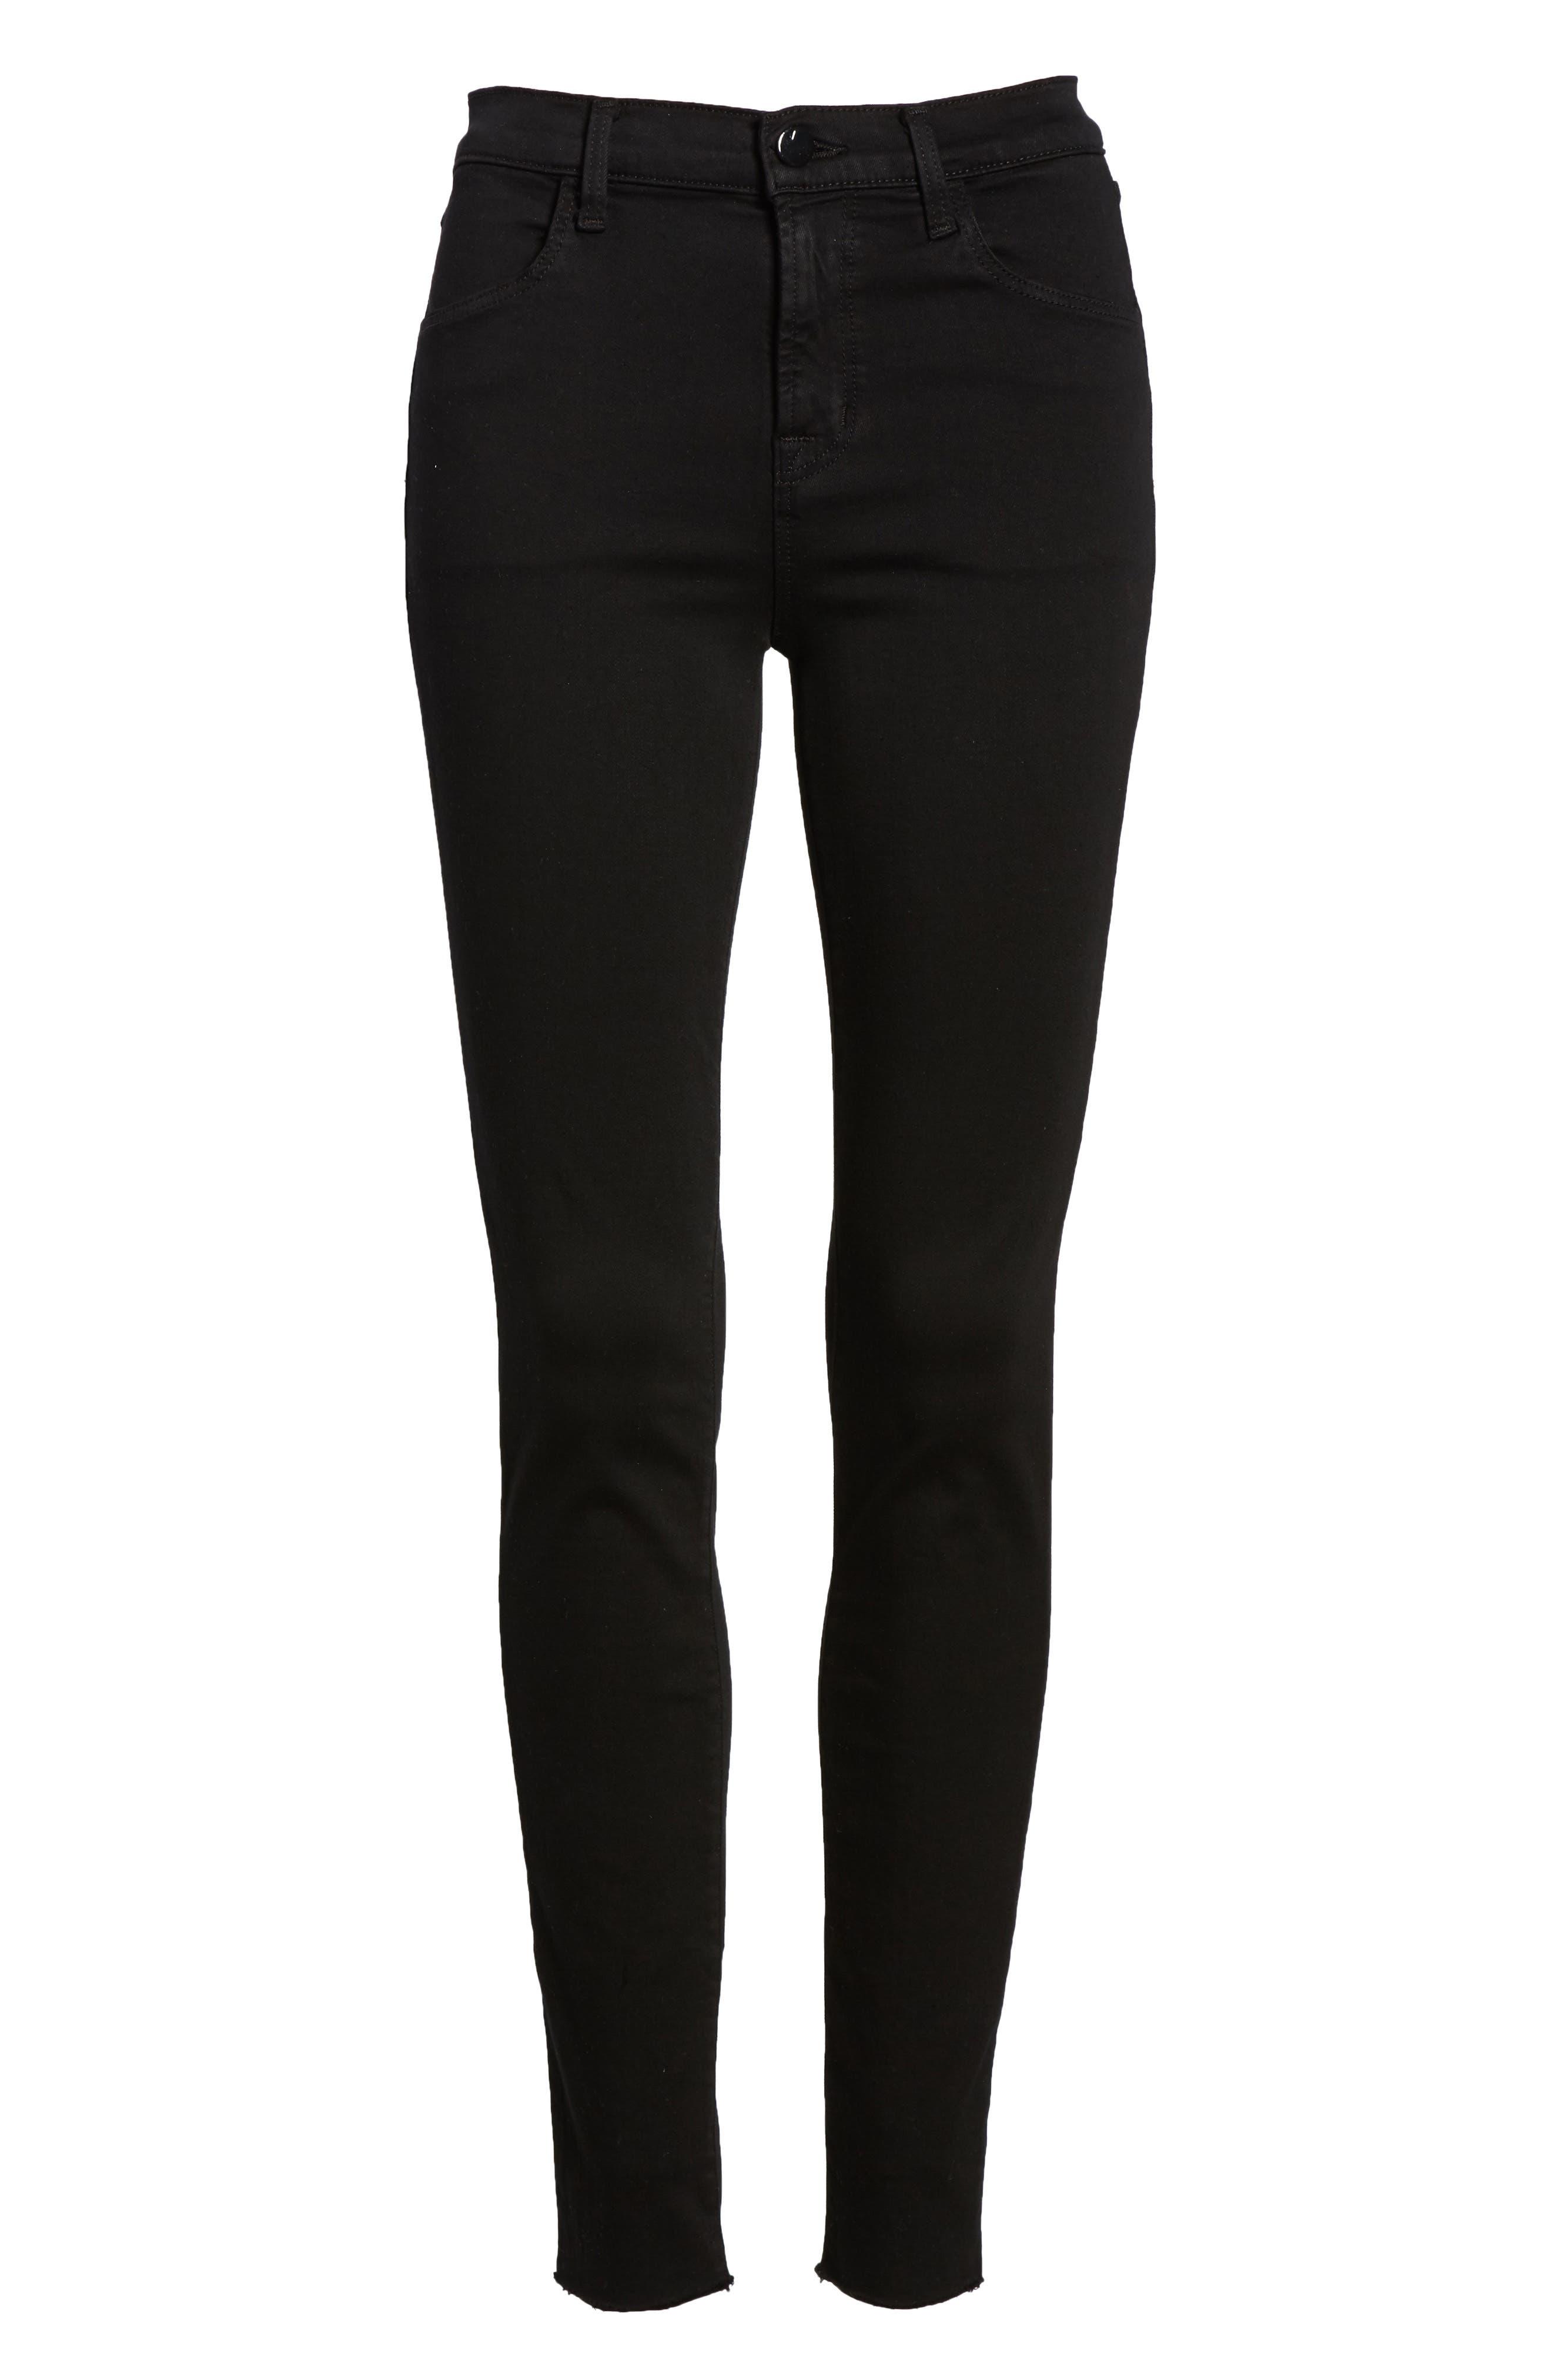 Maria High Waist Skinny Jeans,                             Alternate thumbnail 7, color,                             BLACK BASTILLE